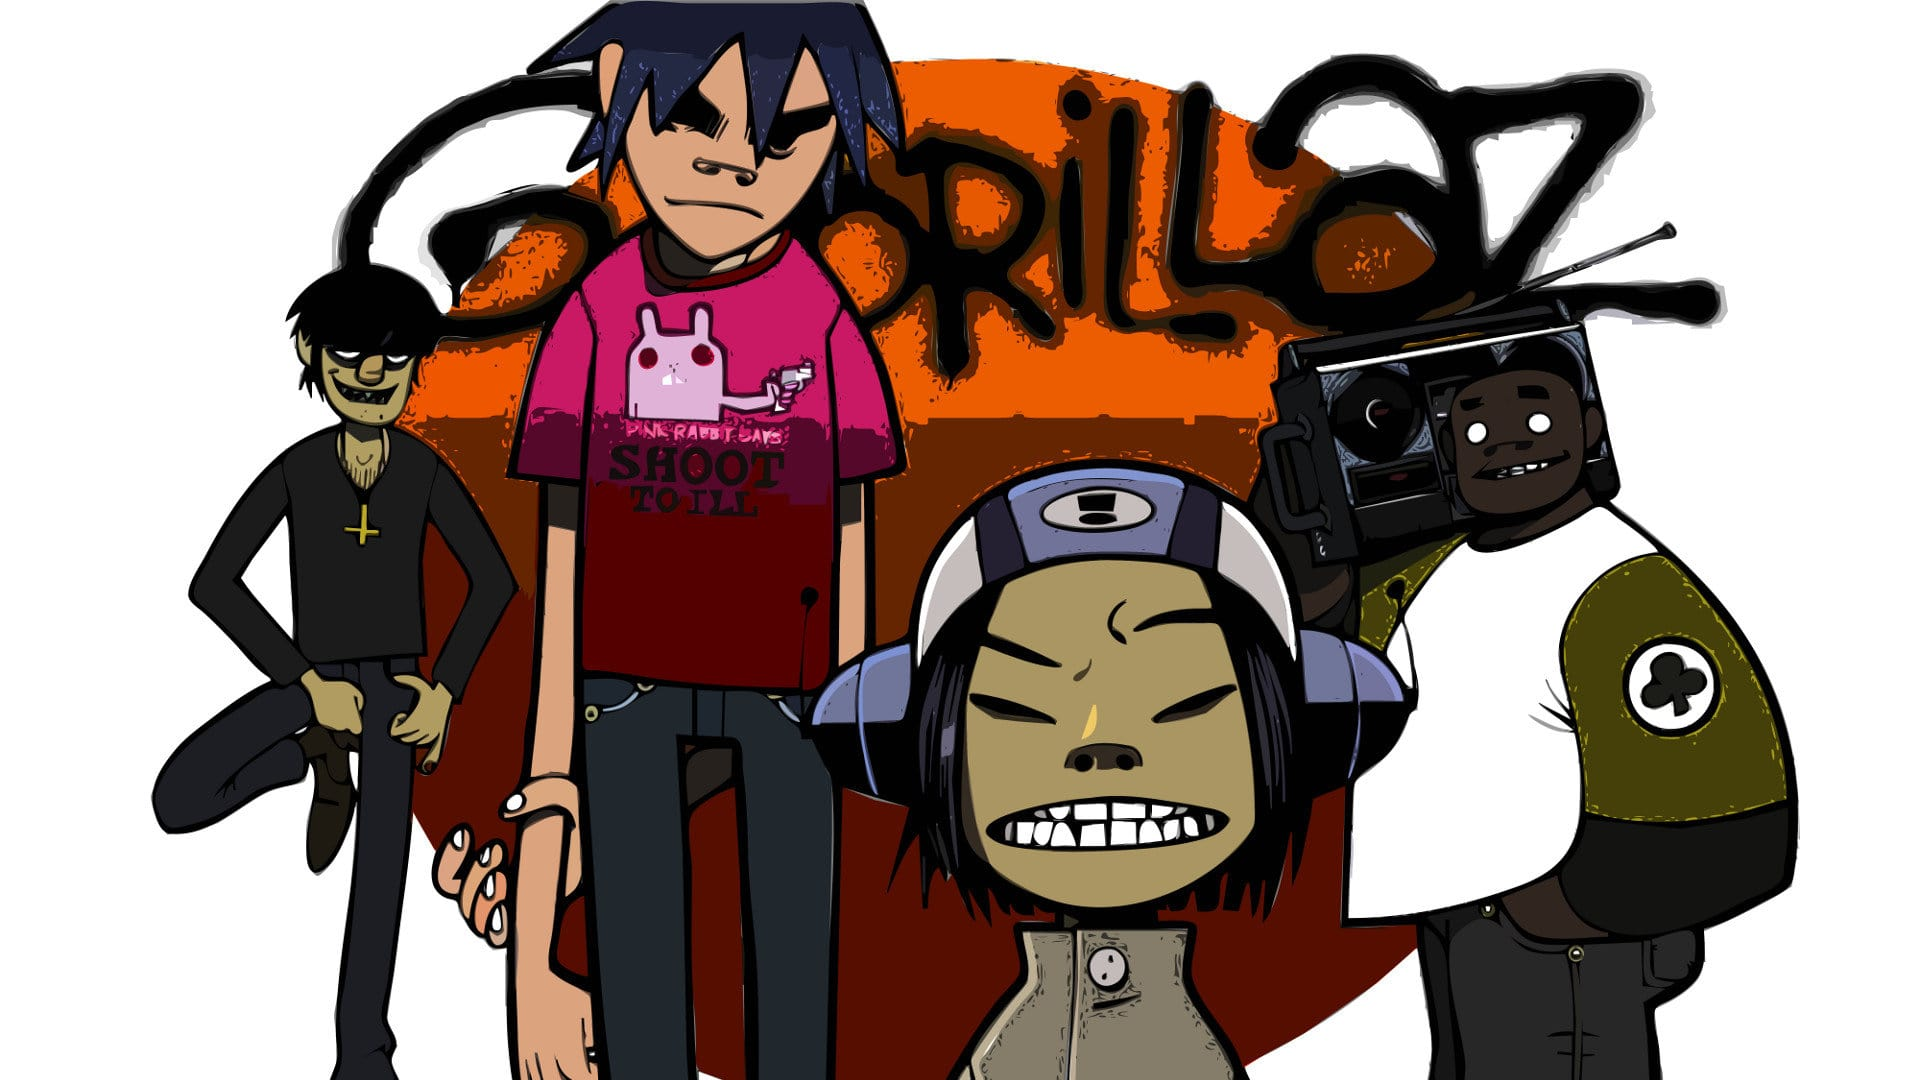 Gorillaz Widescreen